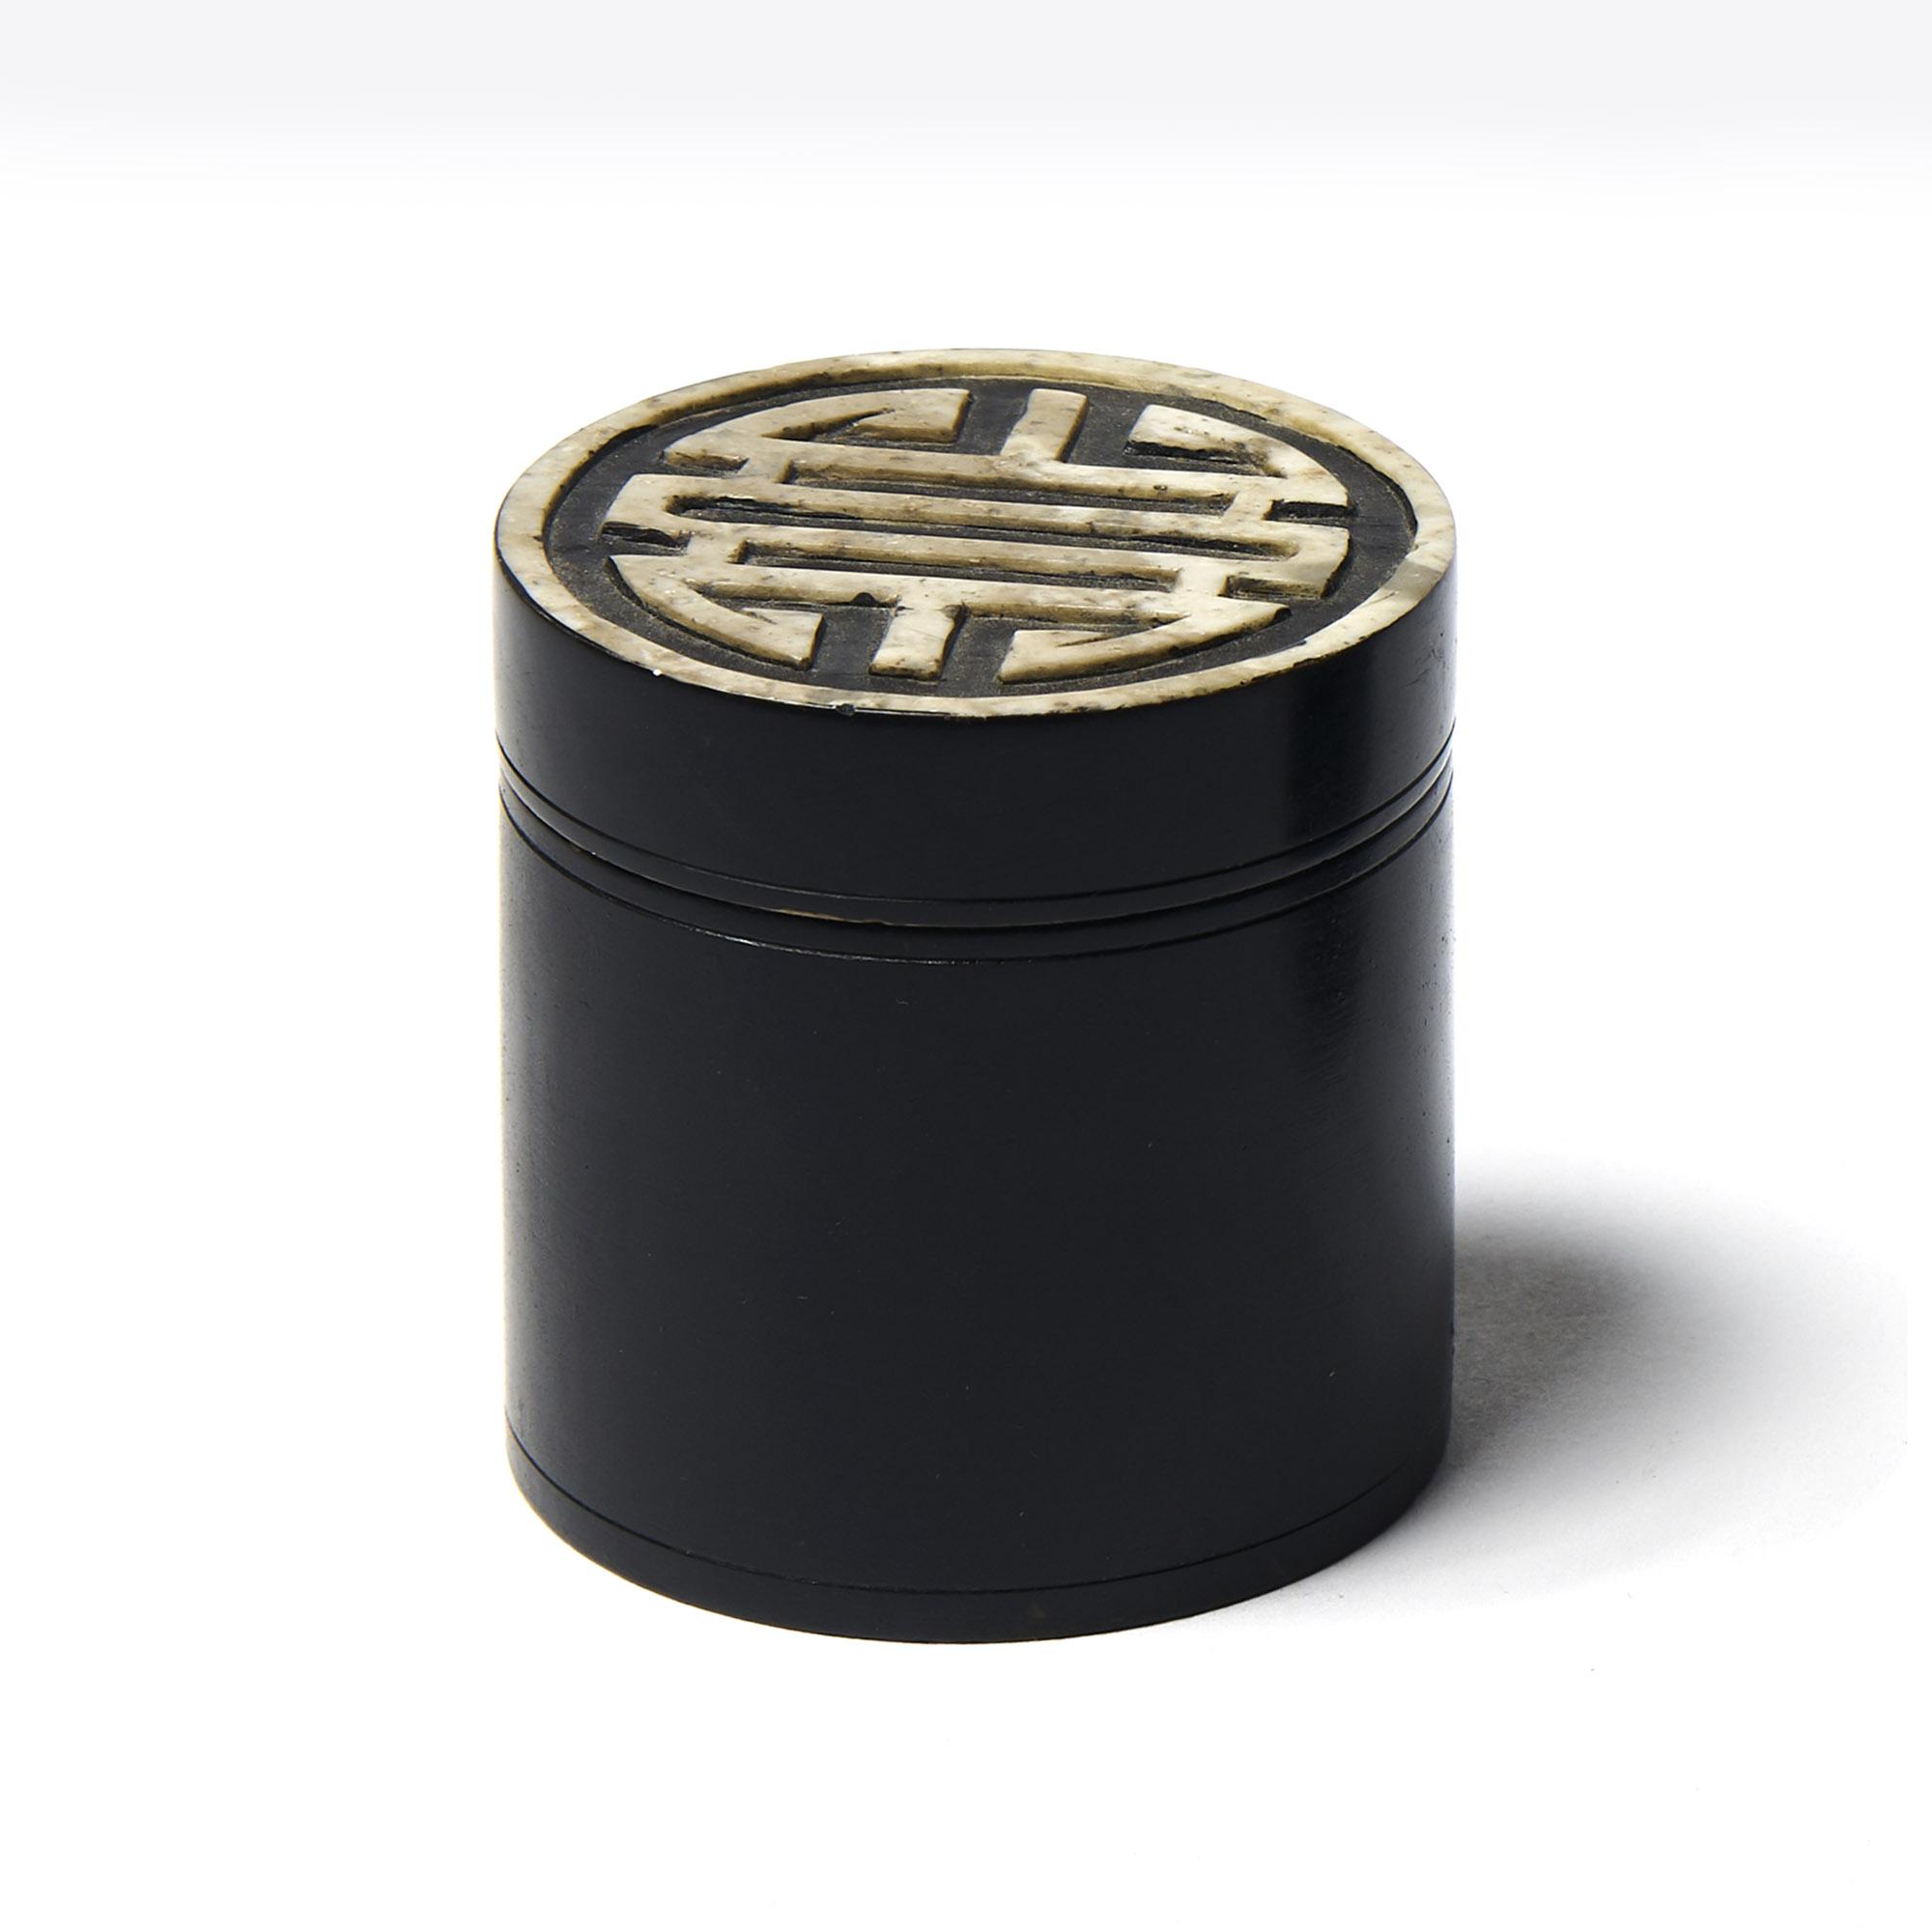 Caja piedra redonda negra símbolo